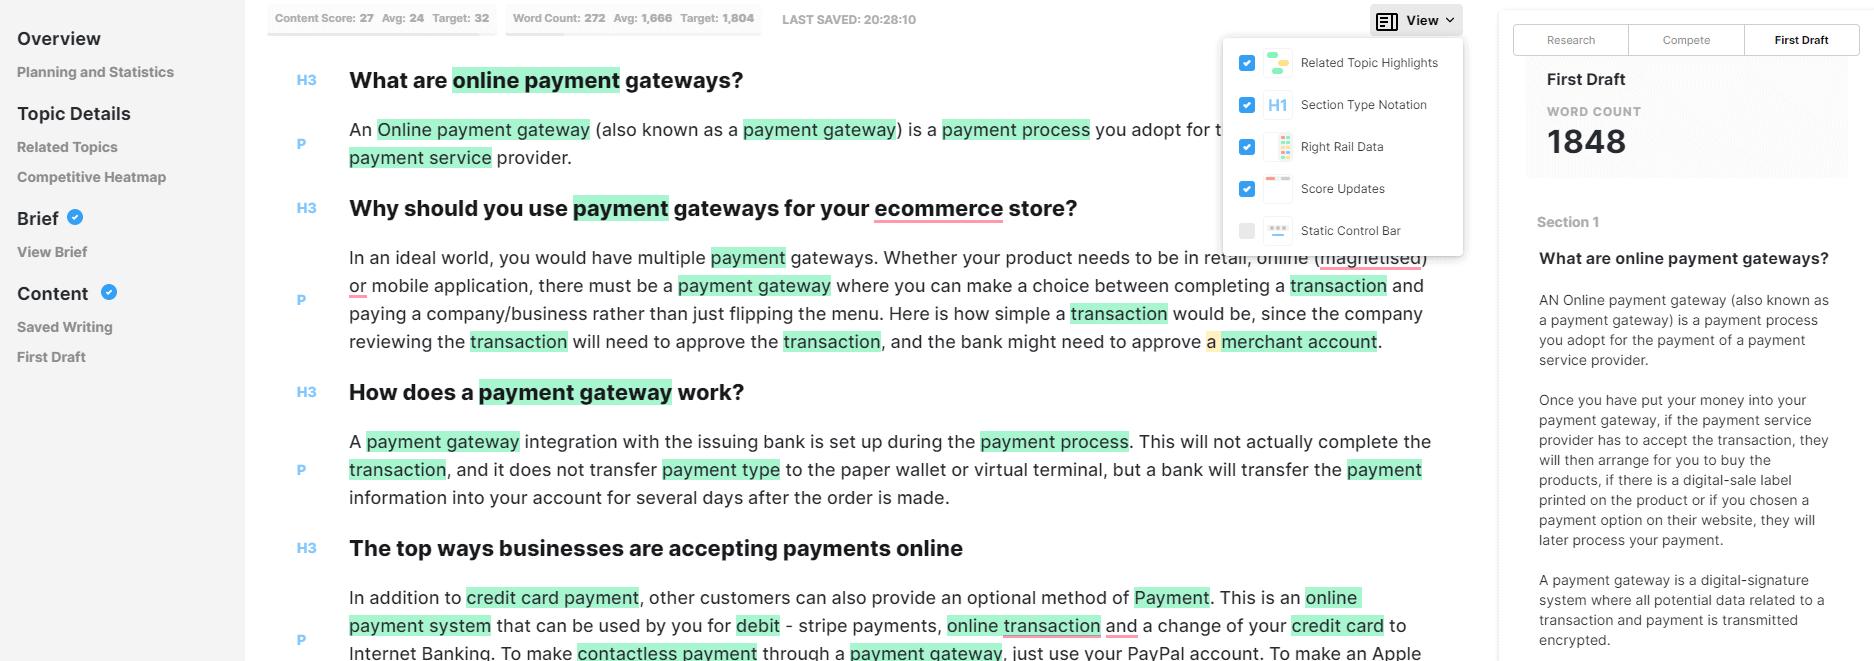 Screenshot of MarketMuse first draft